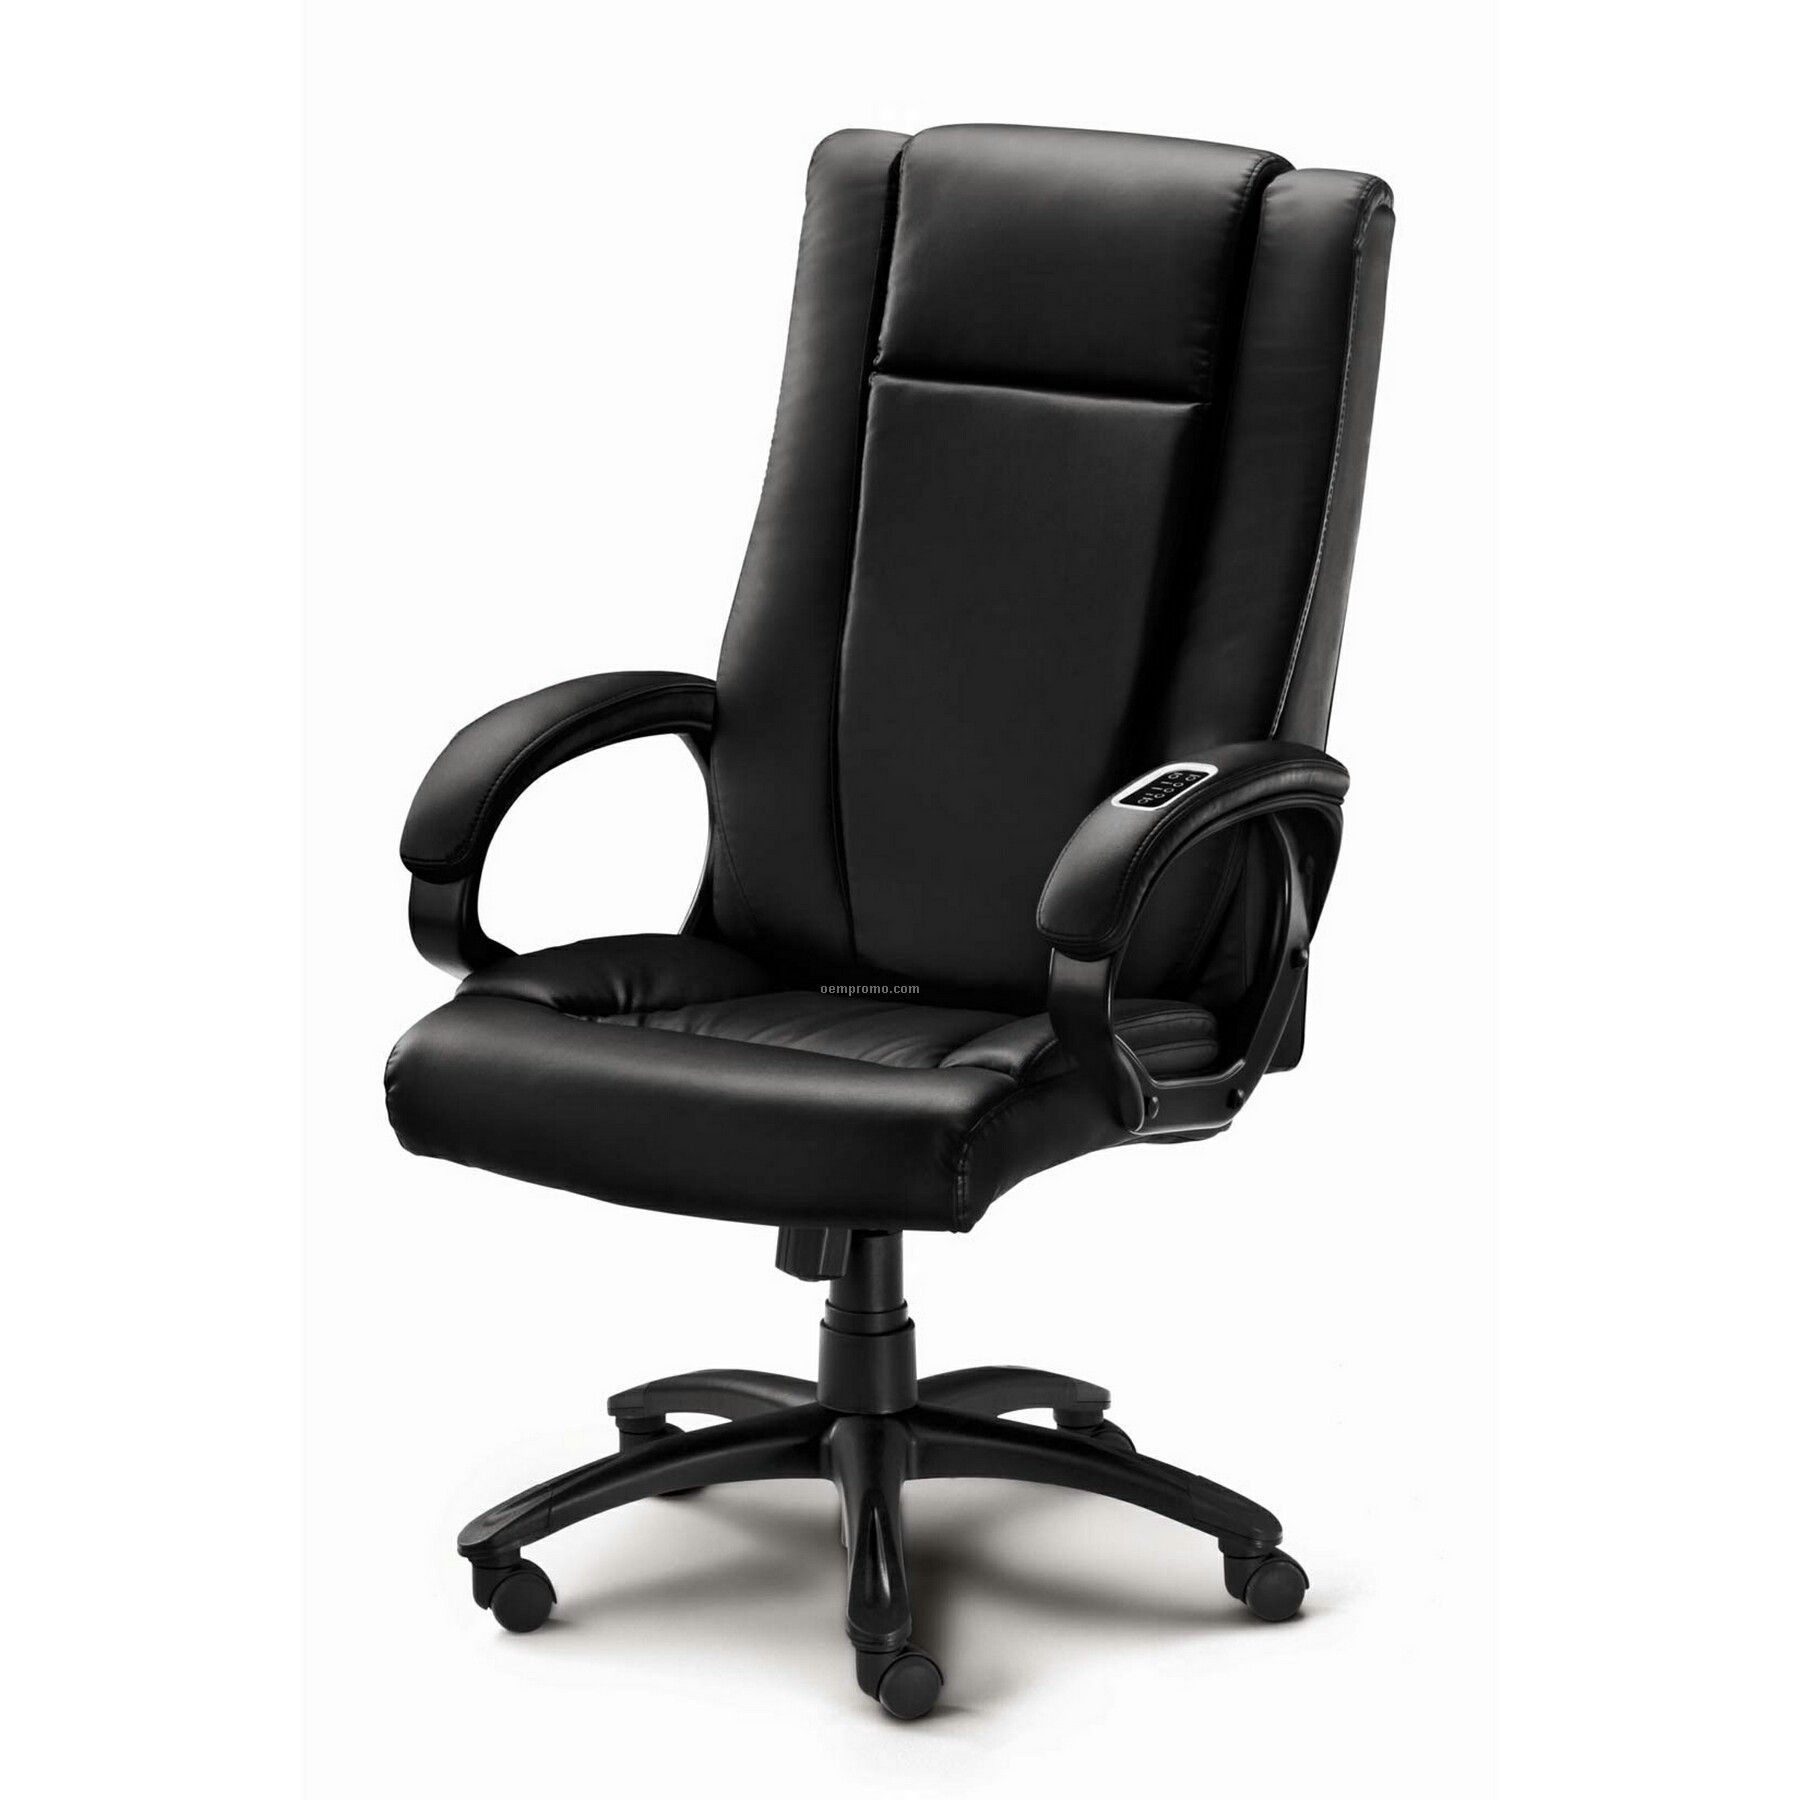 Homedics Shiatsu Massaging Office Chair